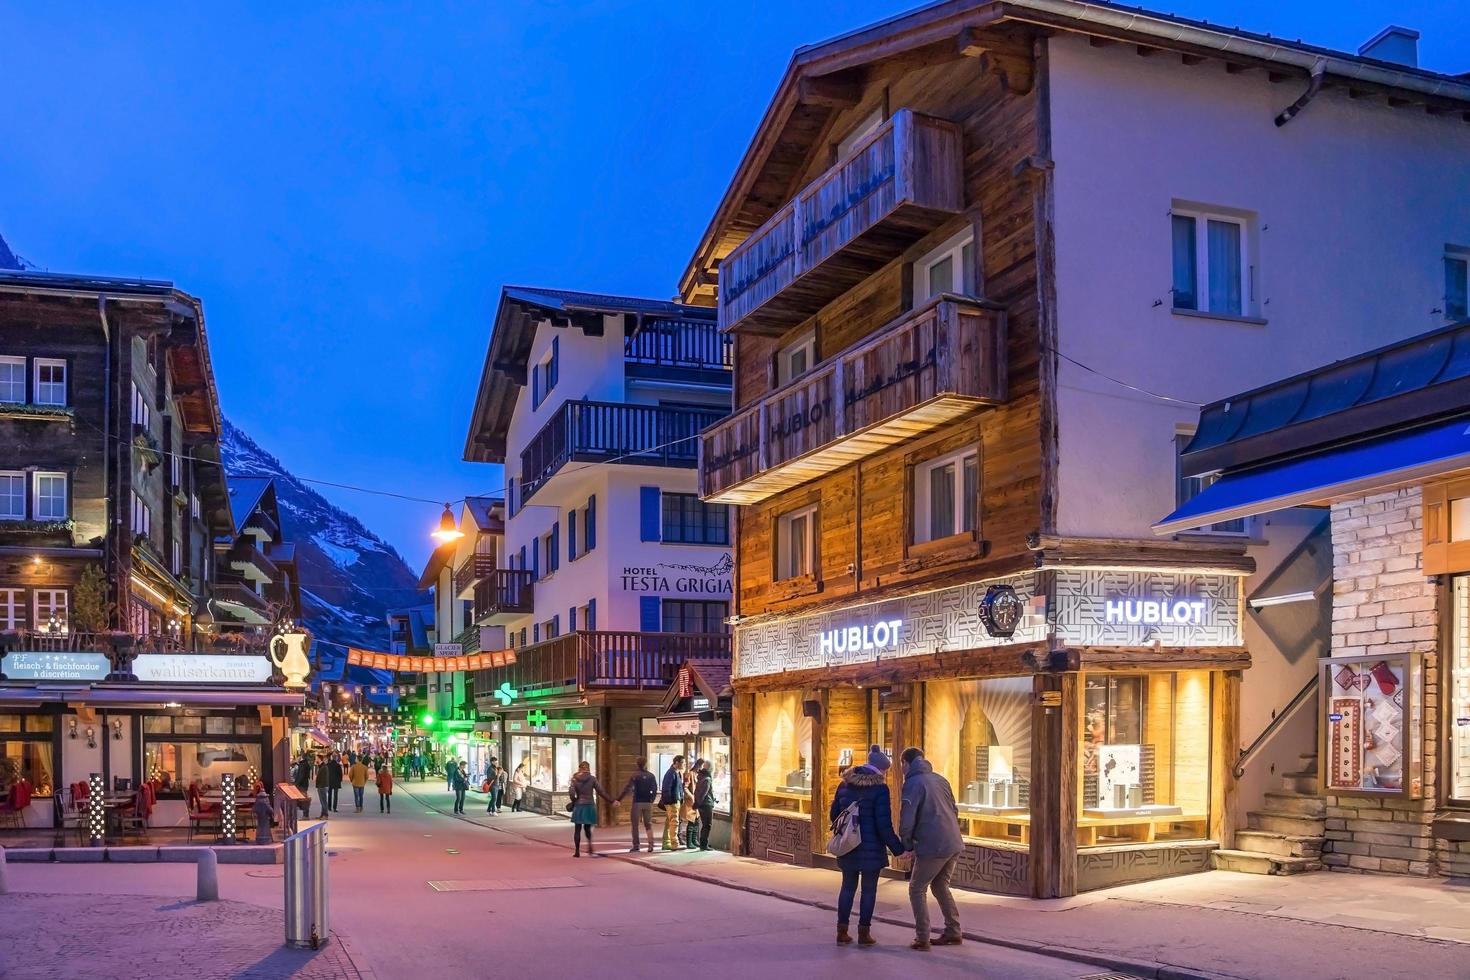 zermatt nel crepuscolo in svizzera foto